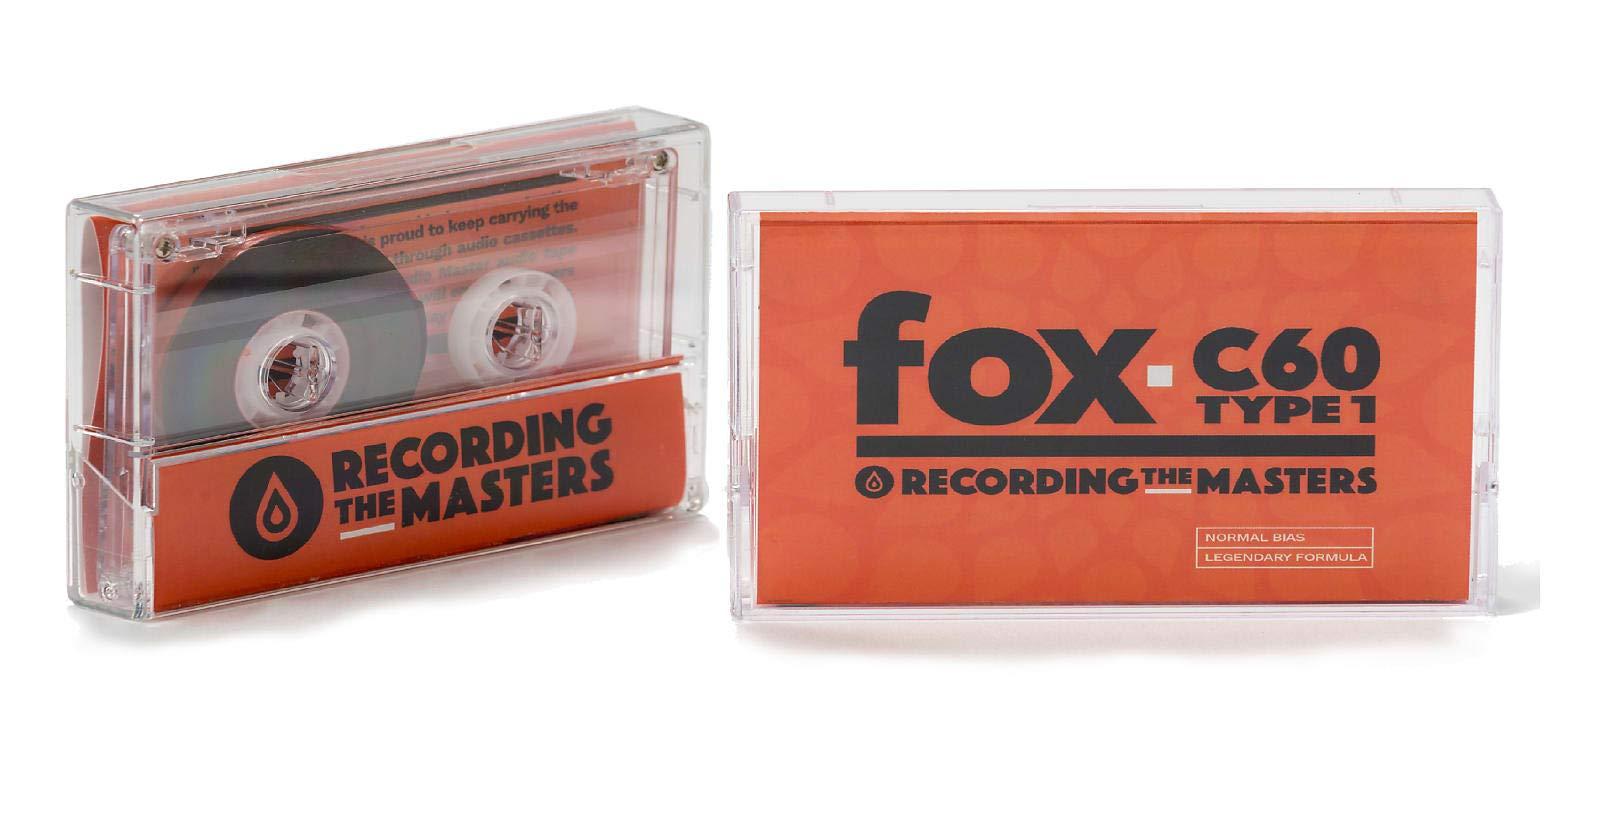 Recording The Masters FOX C60 TYPE 1 Audio Cassettes [Box of 10]